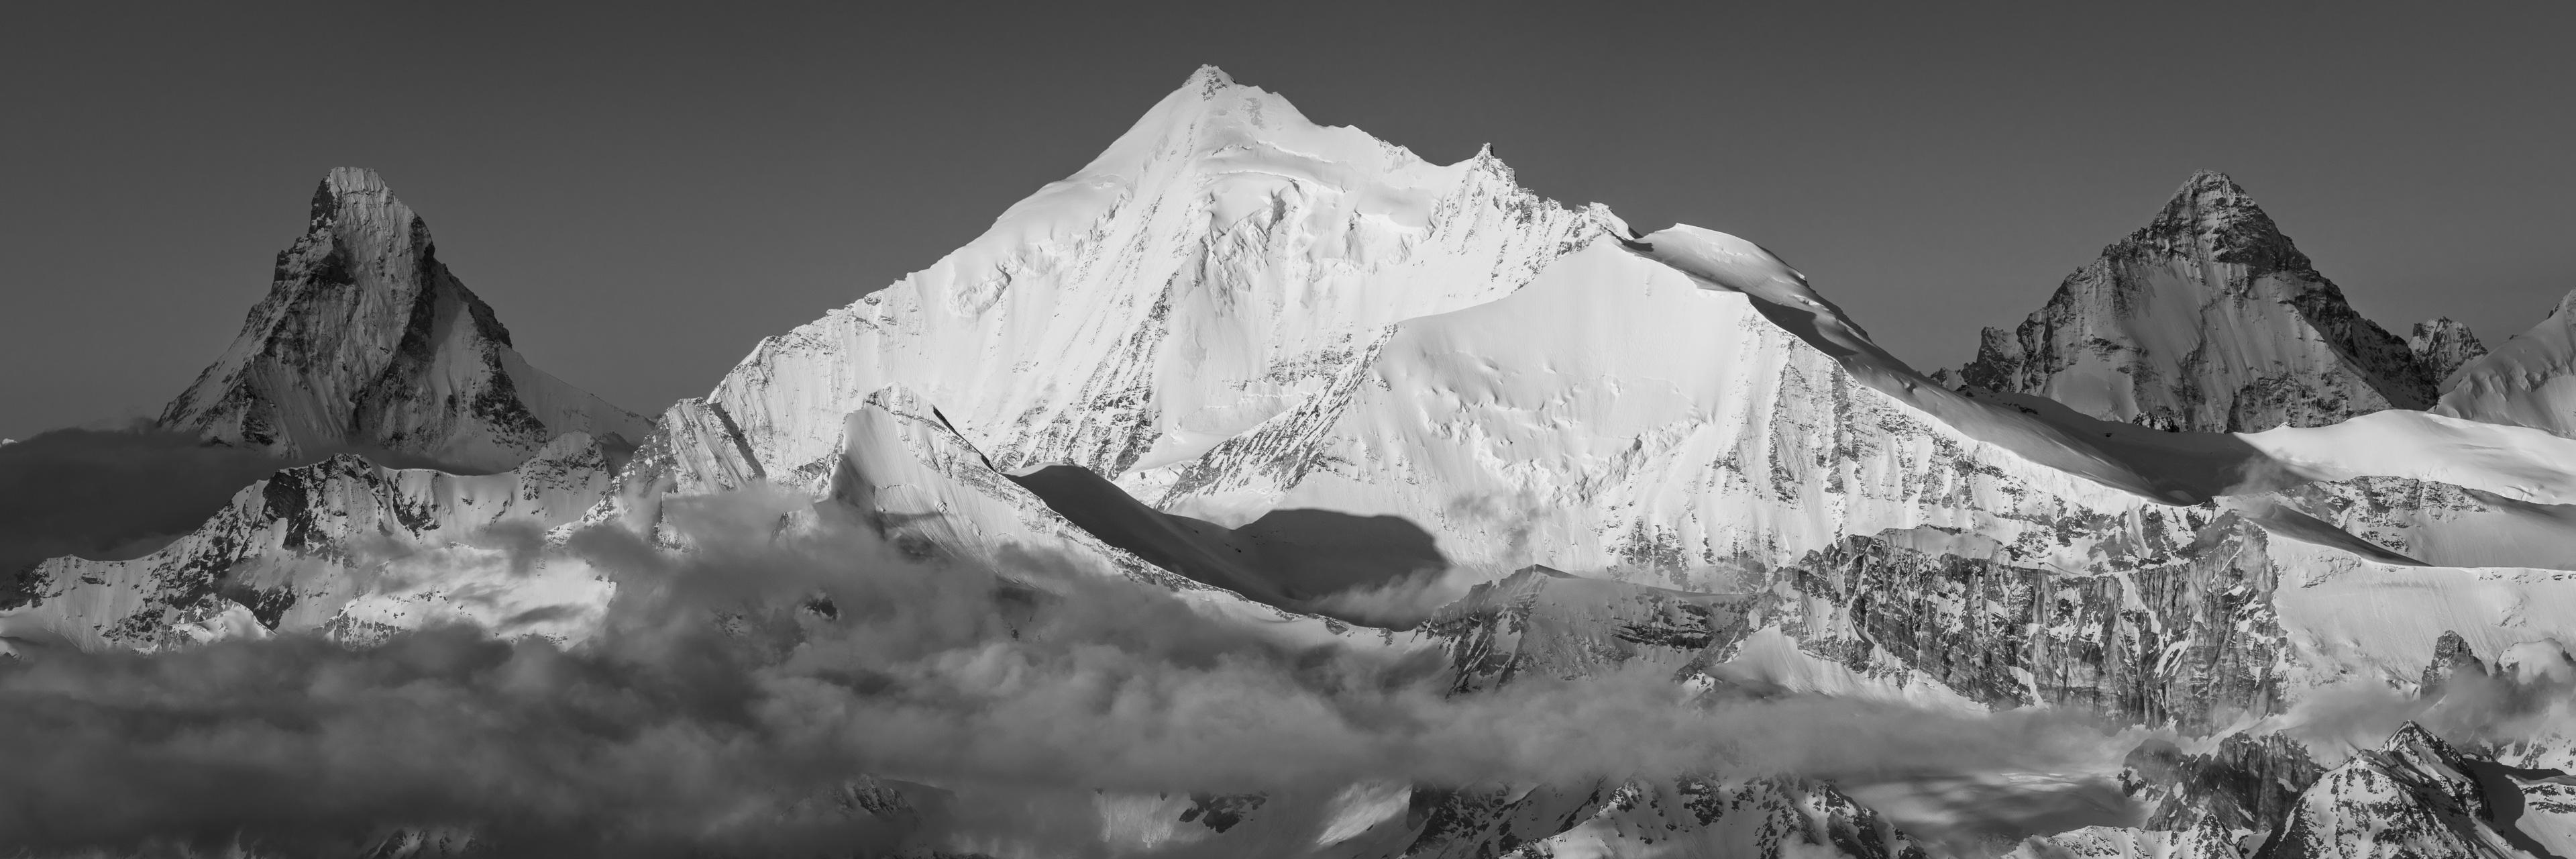 Photo vue Panoramique Dent blanche Valais Alpes Matterhorn